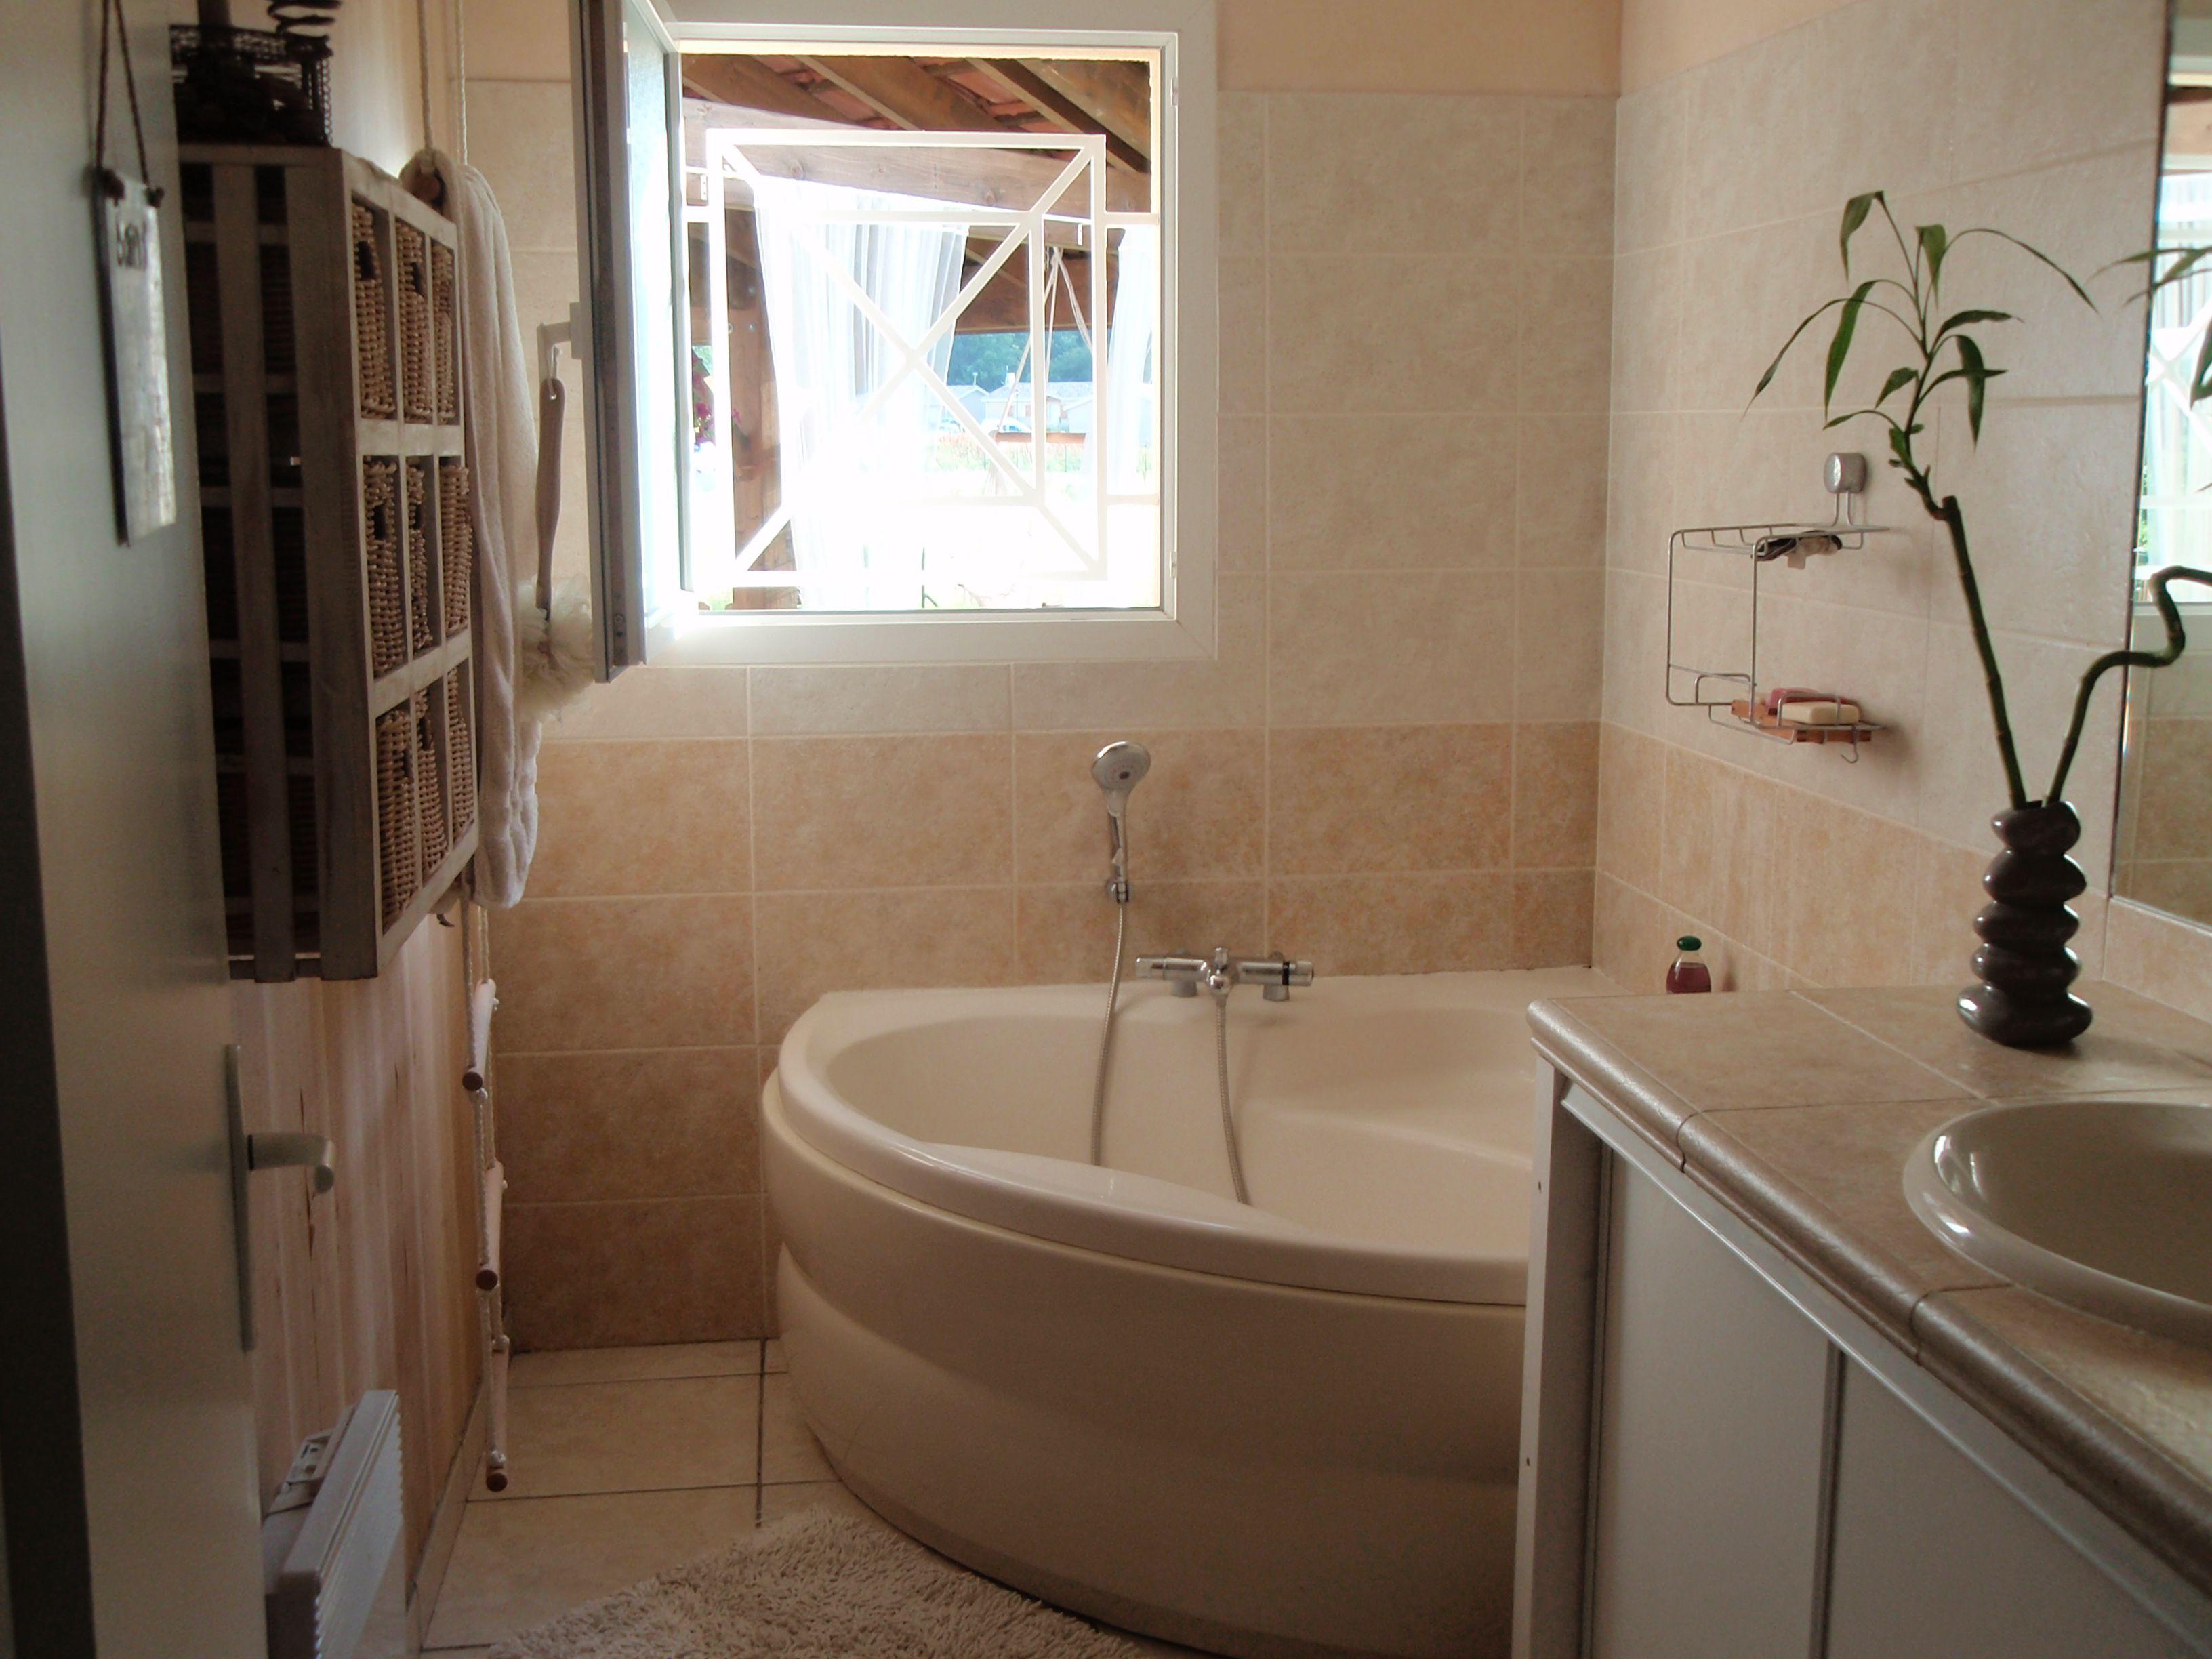 petite baignoire dangle. Black Bedroom Furniture Sets. Home Design Ideas